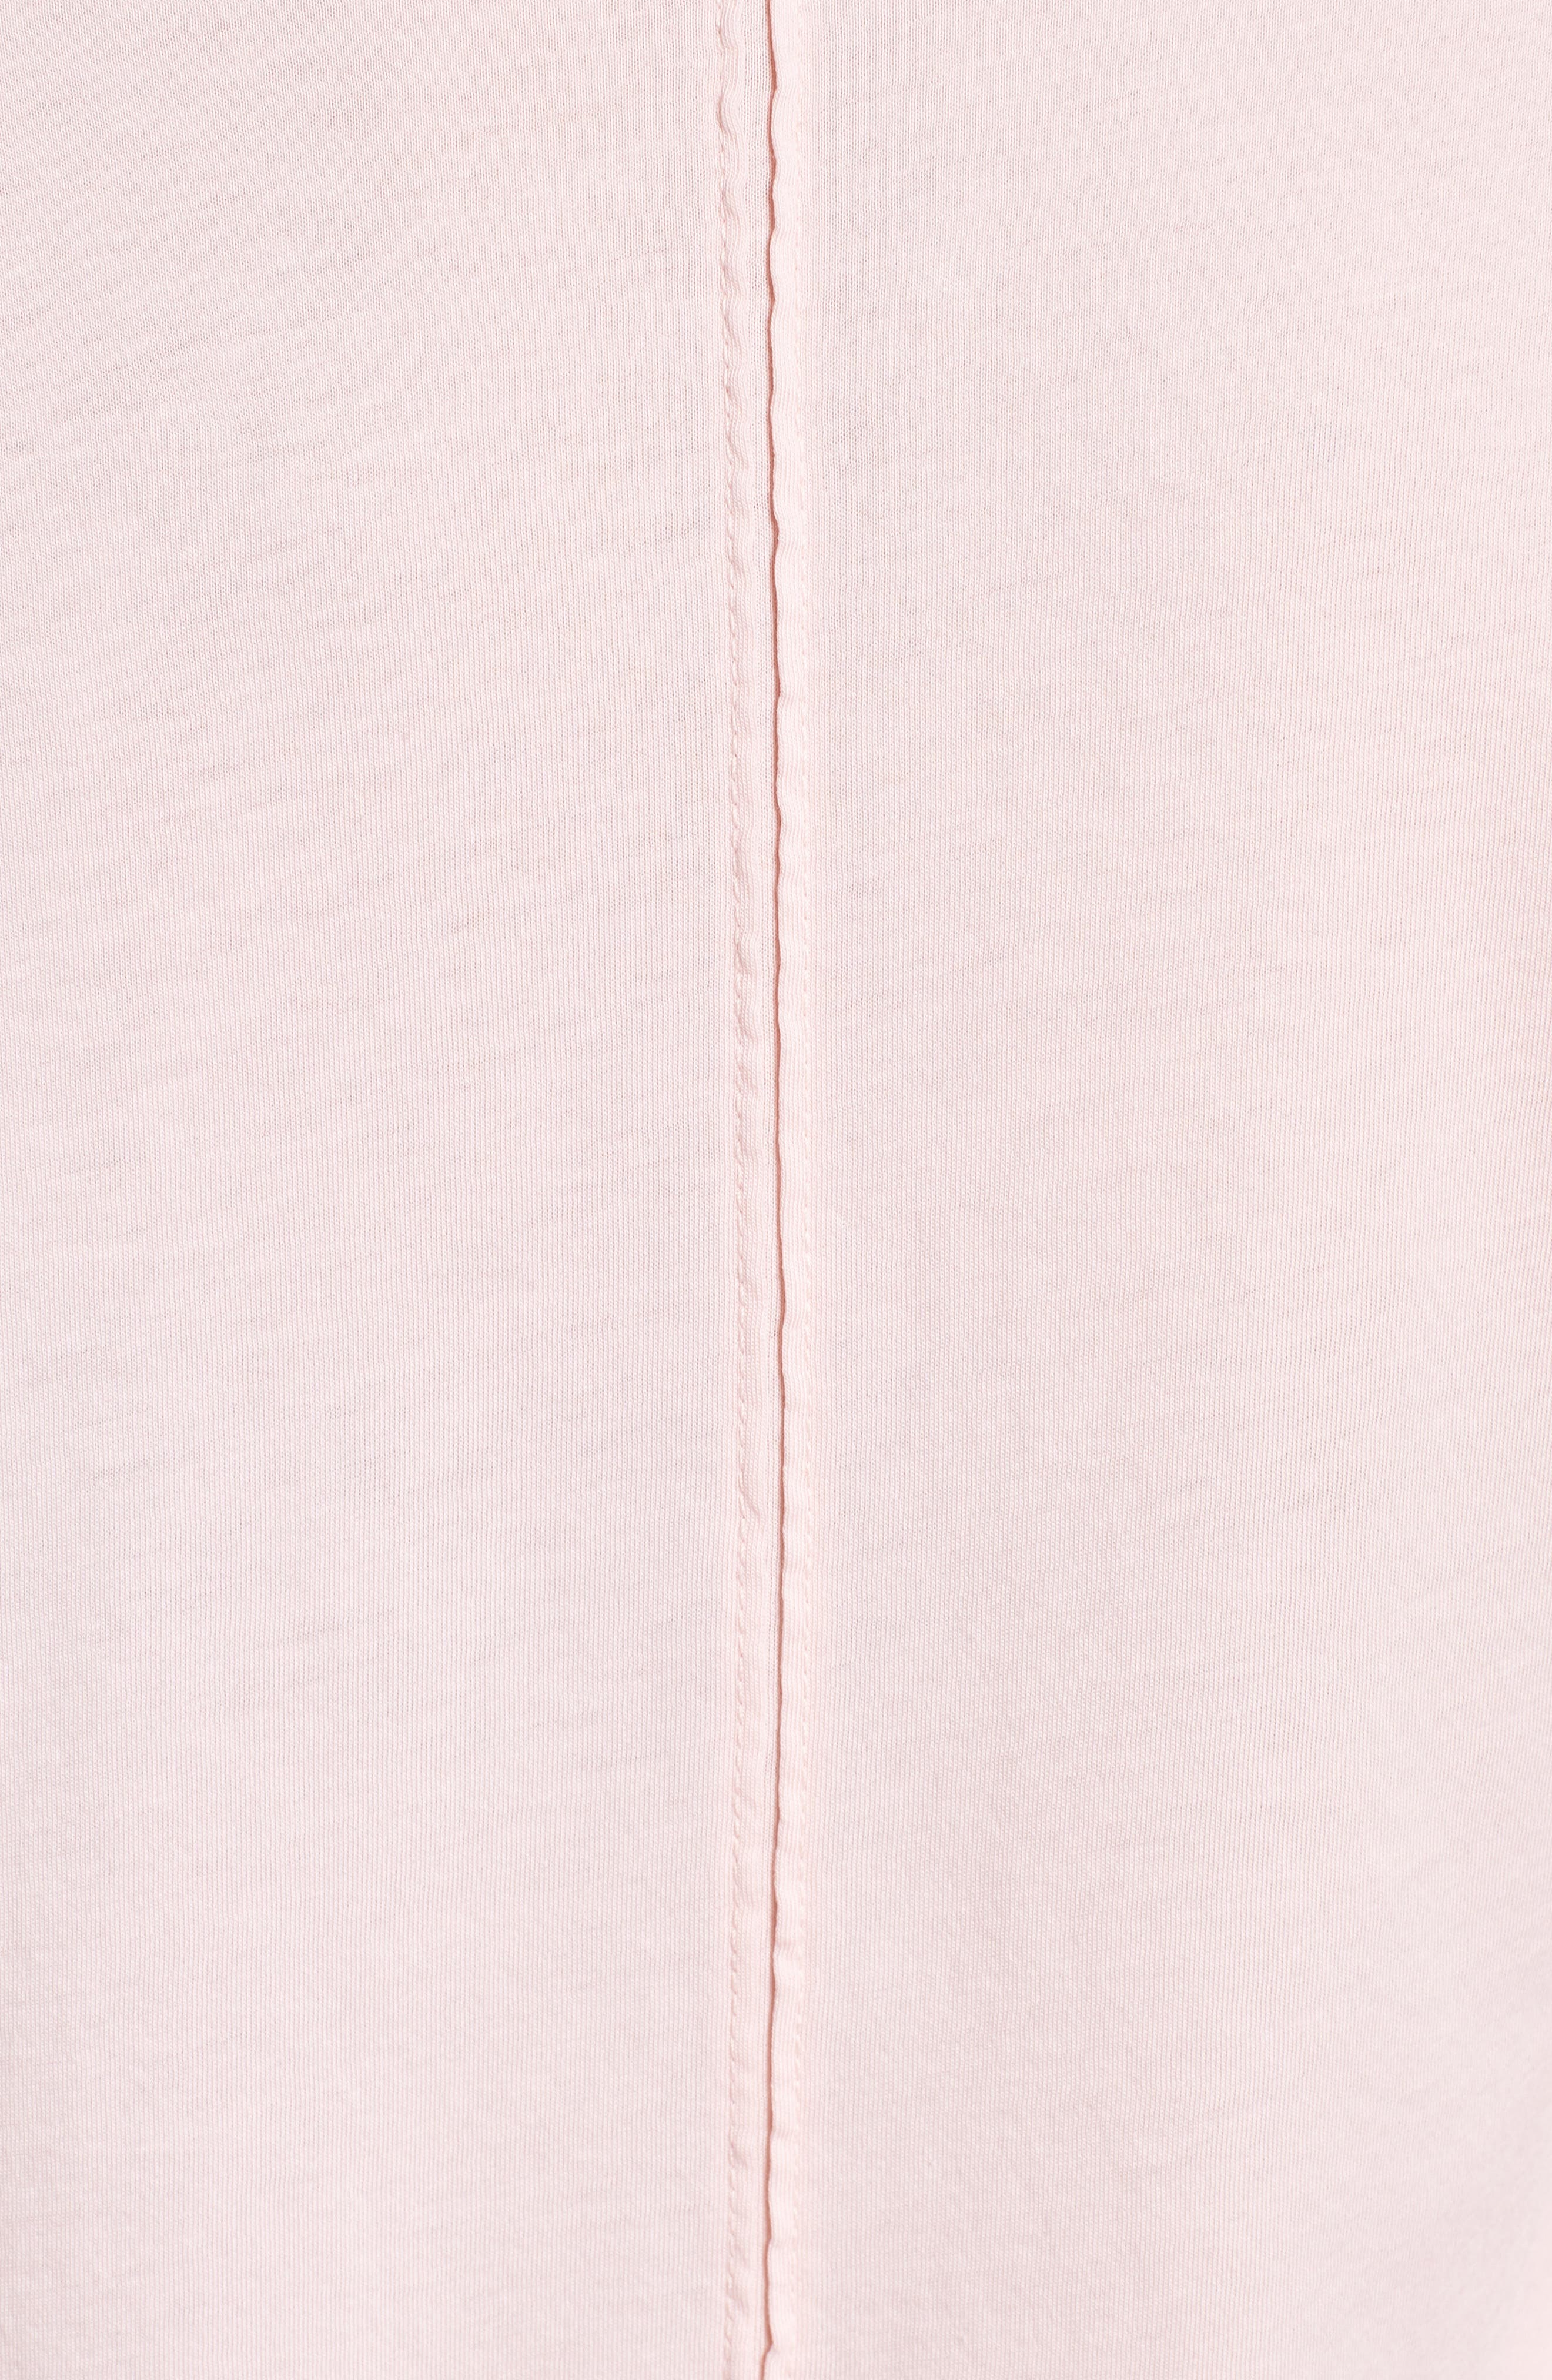 Henson Tee,                             Alternate thumbnail 166, color,